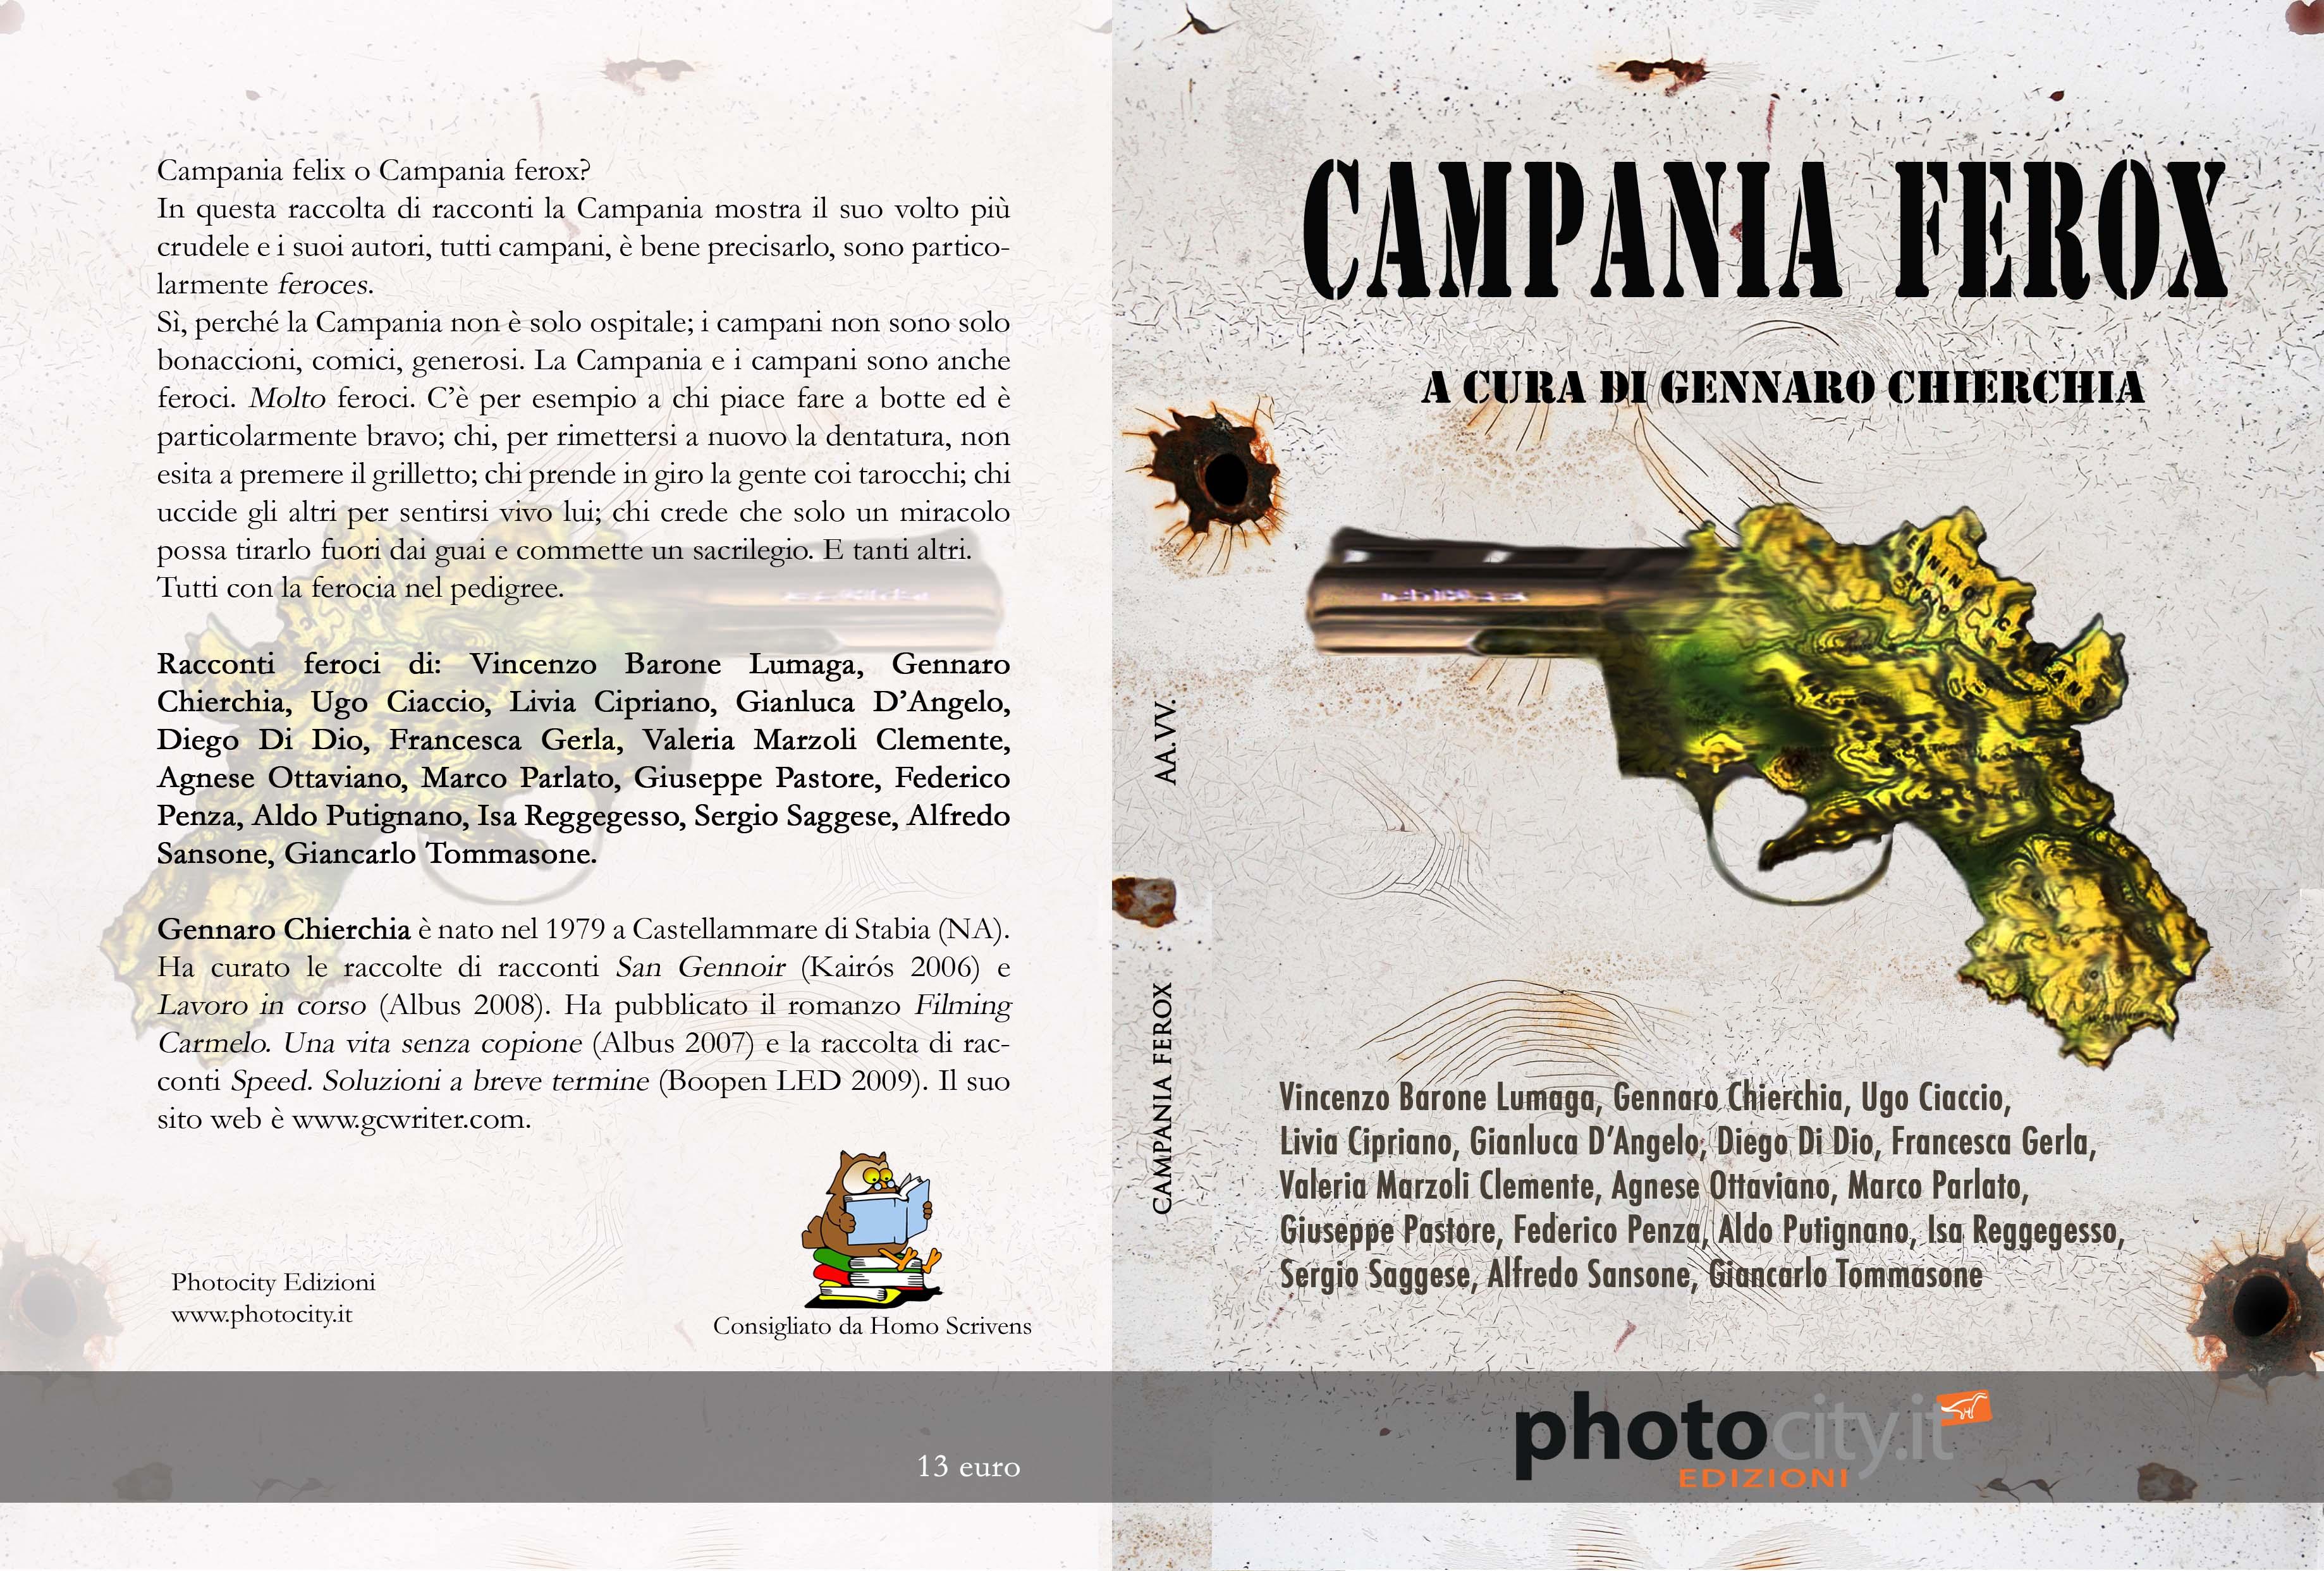 Campania Ferox